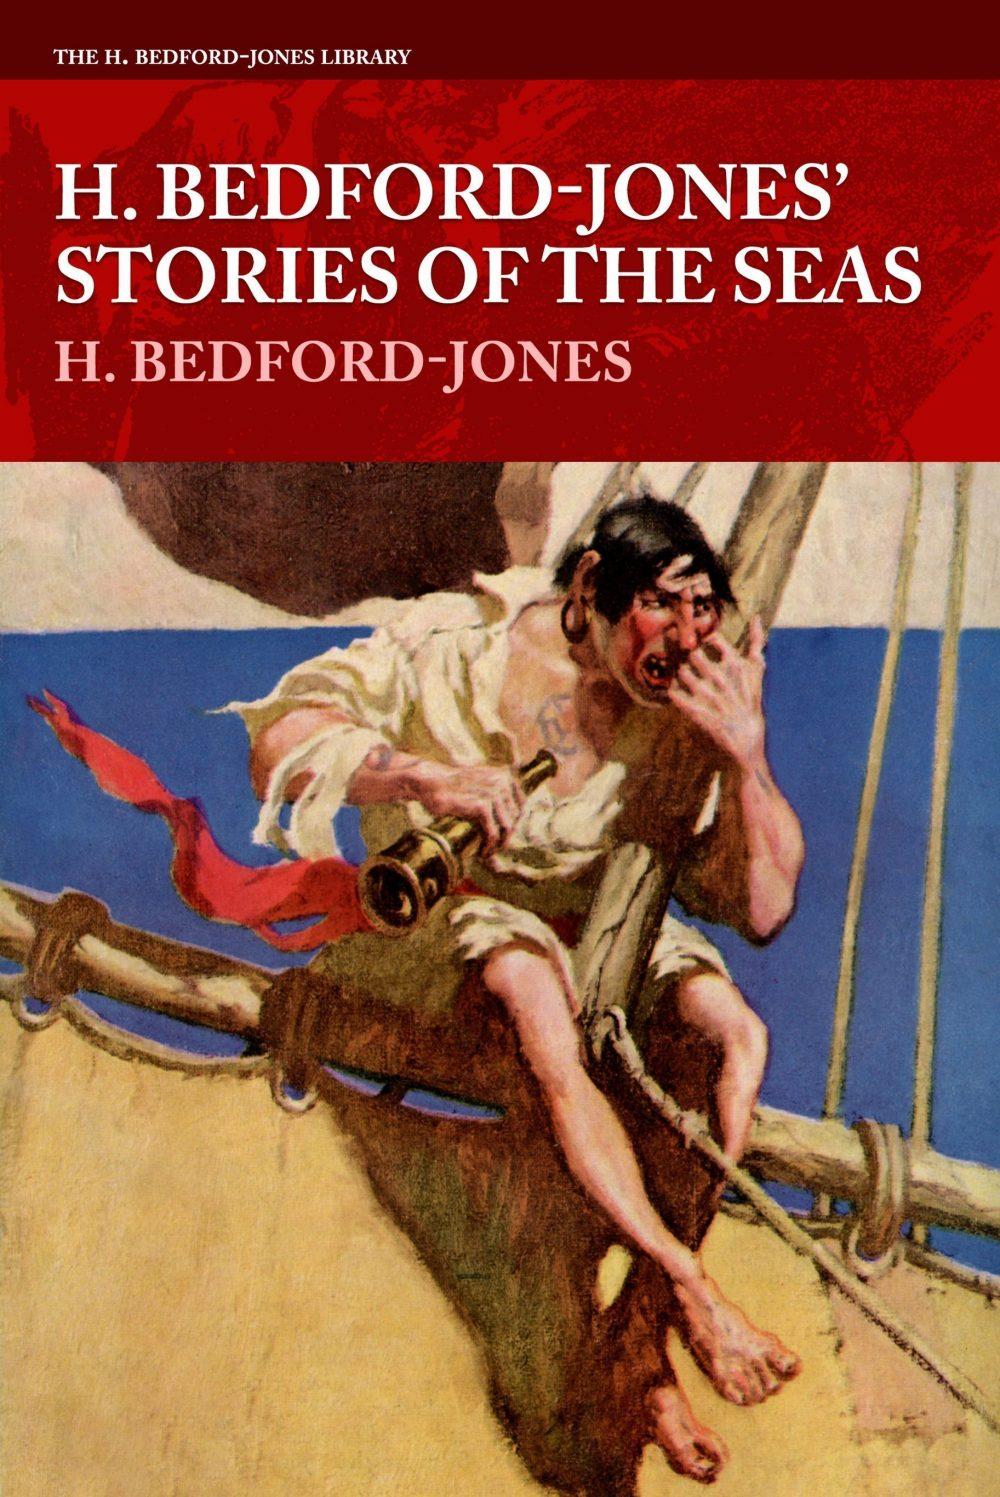 H. Bedford-Jones' Stories of the Seas (The H. Bedford-Jones Library)